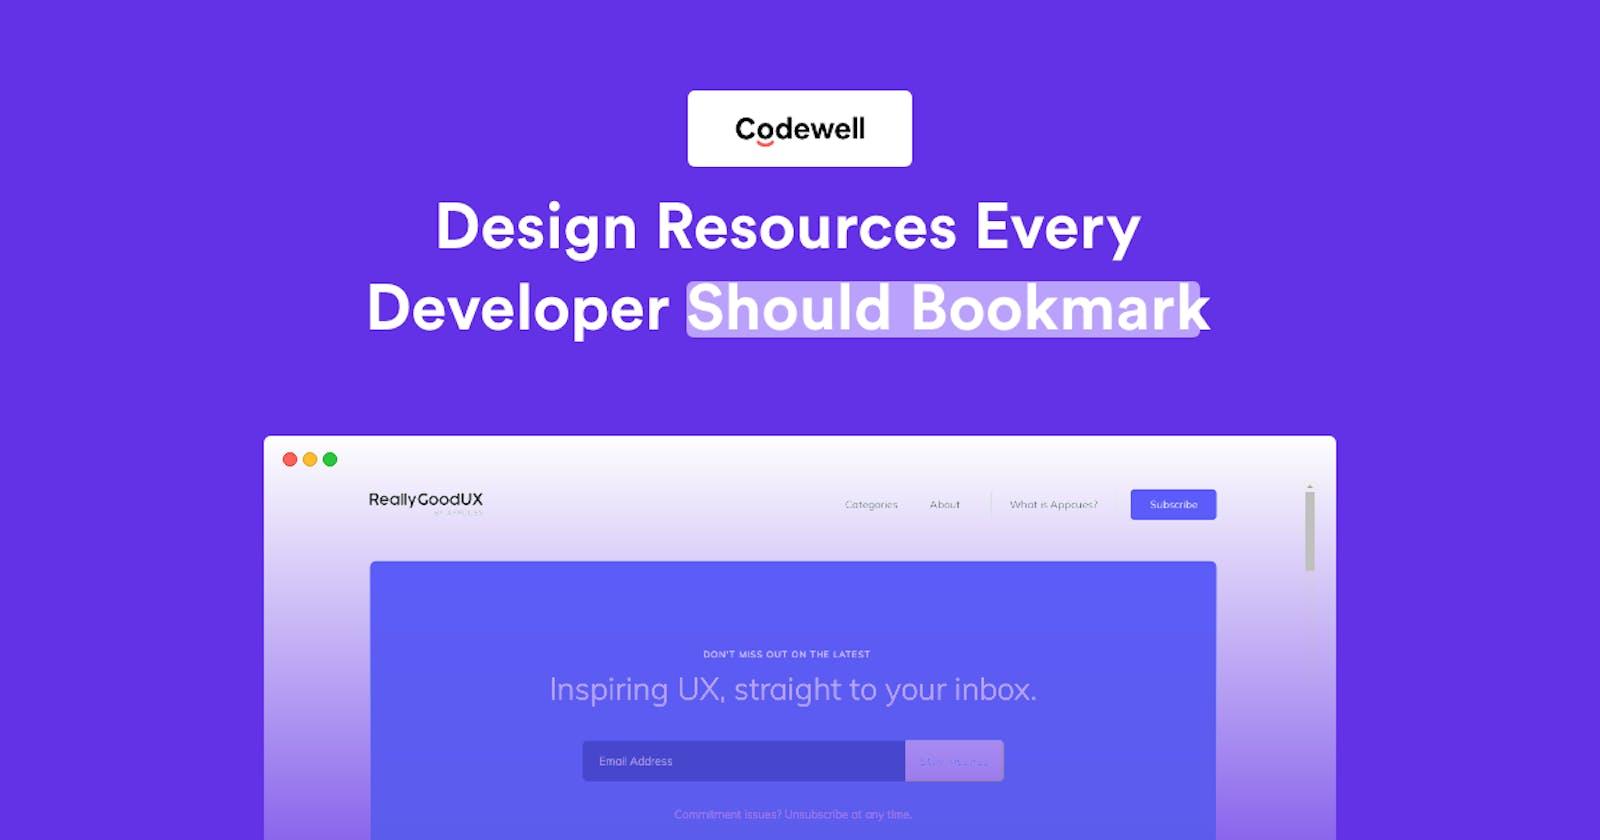 Design Resources Every Developer Should Bookmark